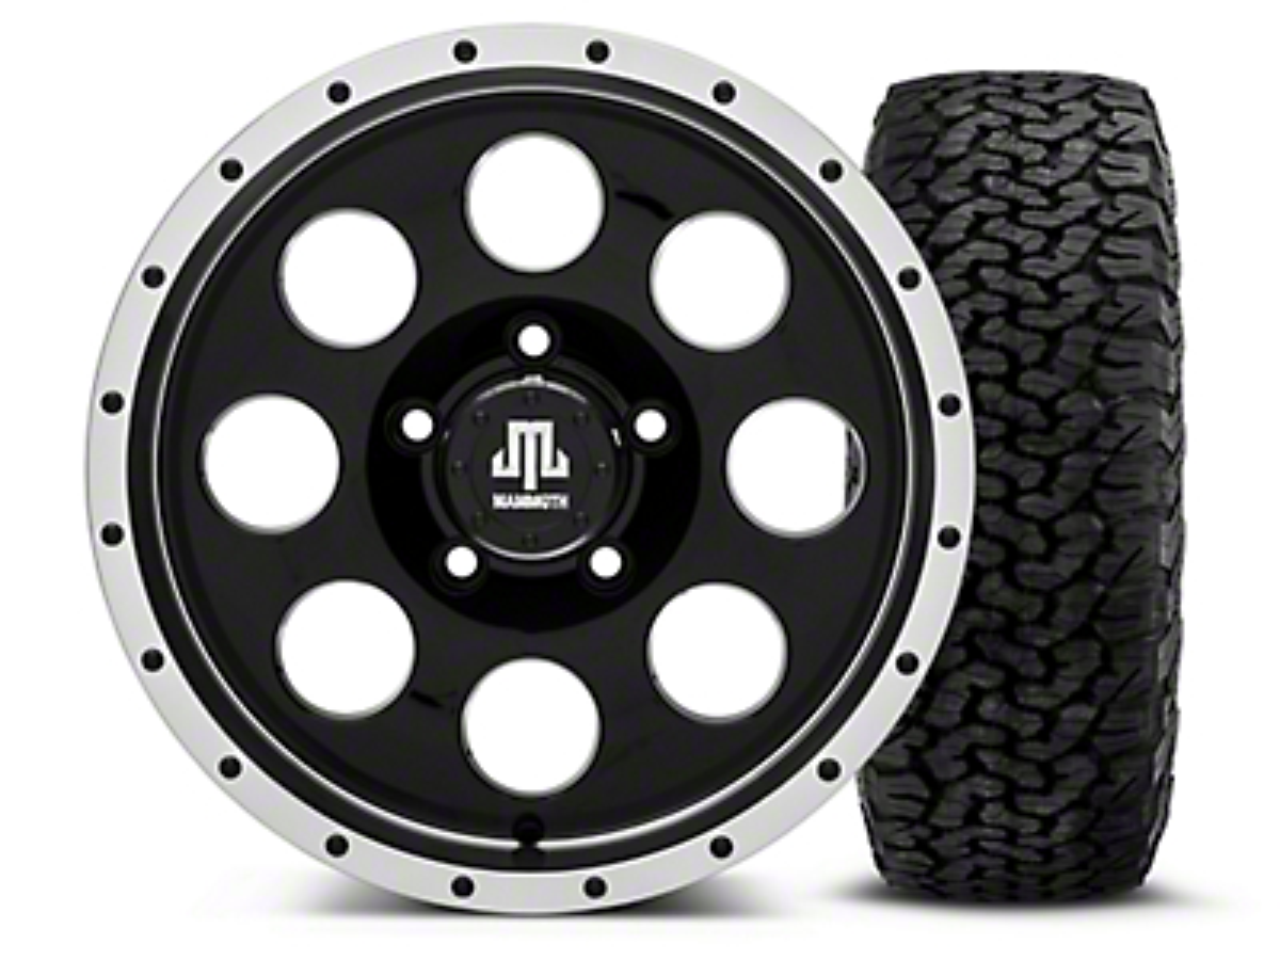 Mammoth 8 Beadlock Style Black - 16x8 Wheel - and BF Goodrich All Terrain TA KO2 Tire - 305/70R16 (07-18 Jeep Wrangler JK; 2018 Jeep Wrangler JL)